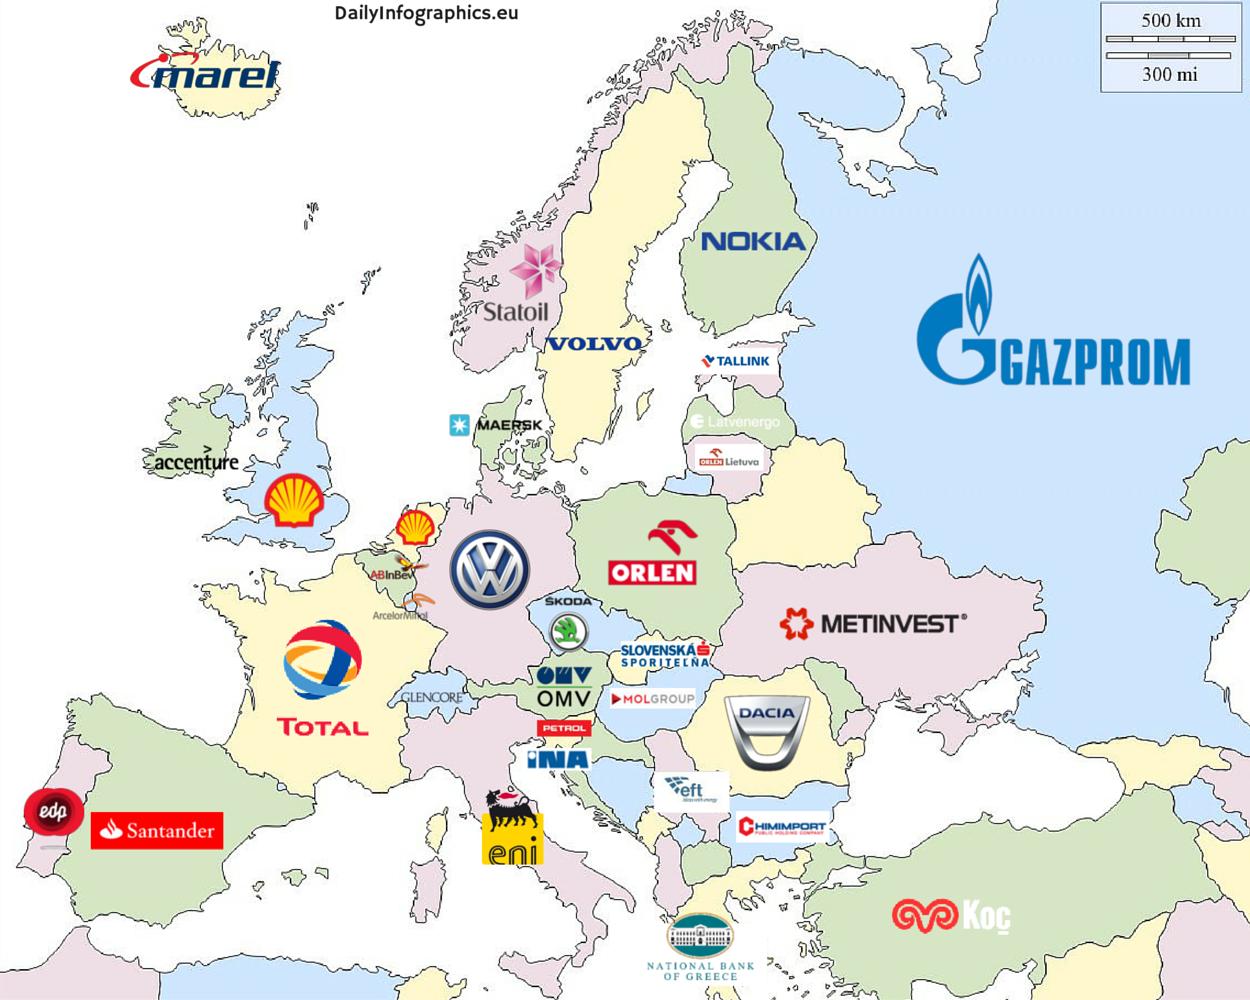 Infographic: the Biggest European Companies